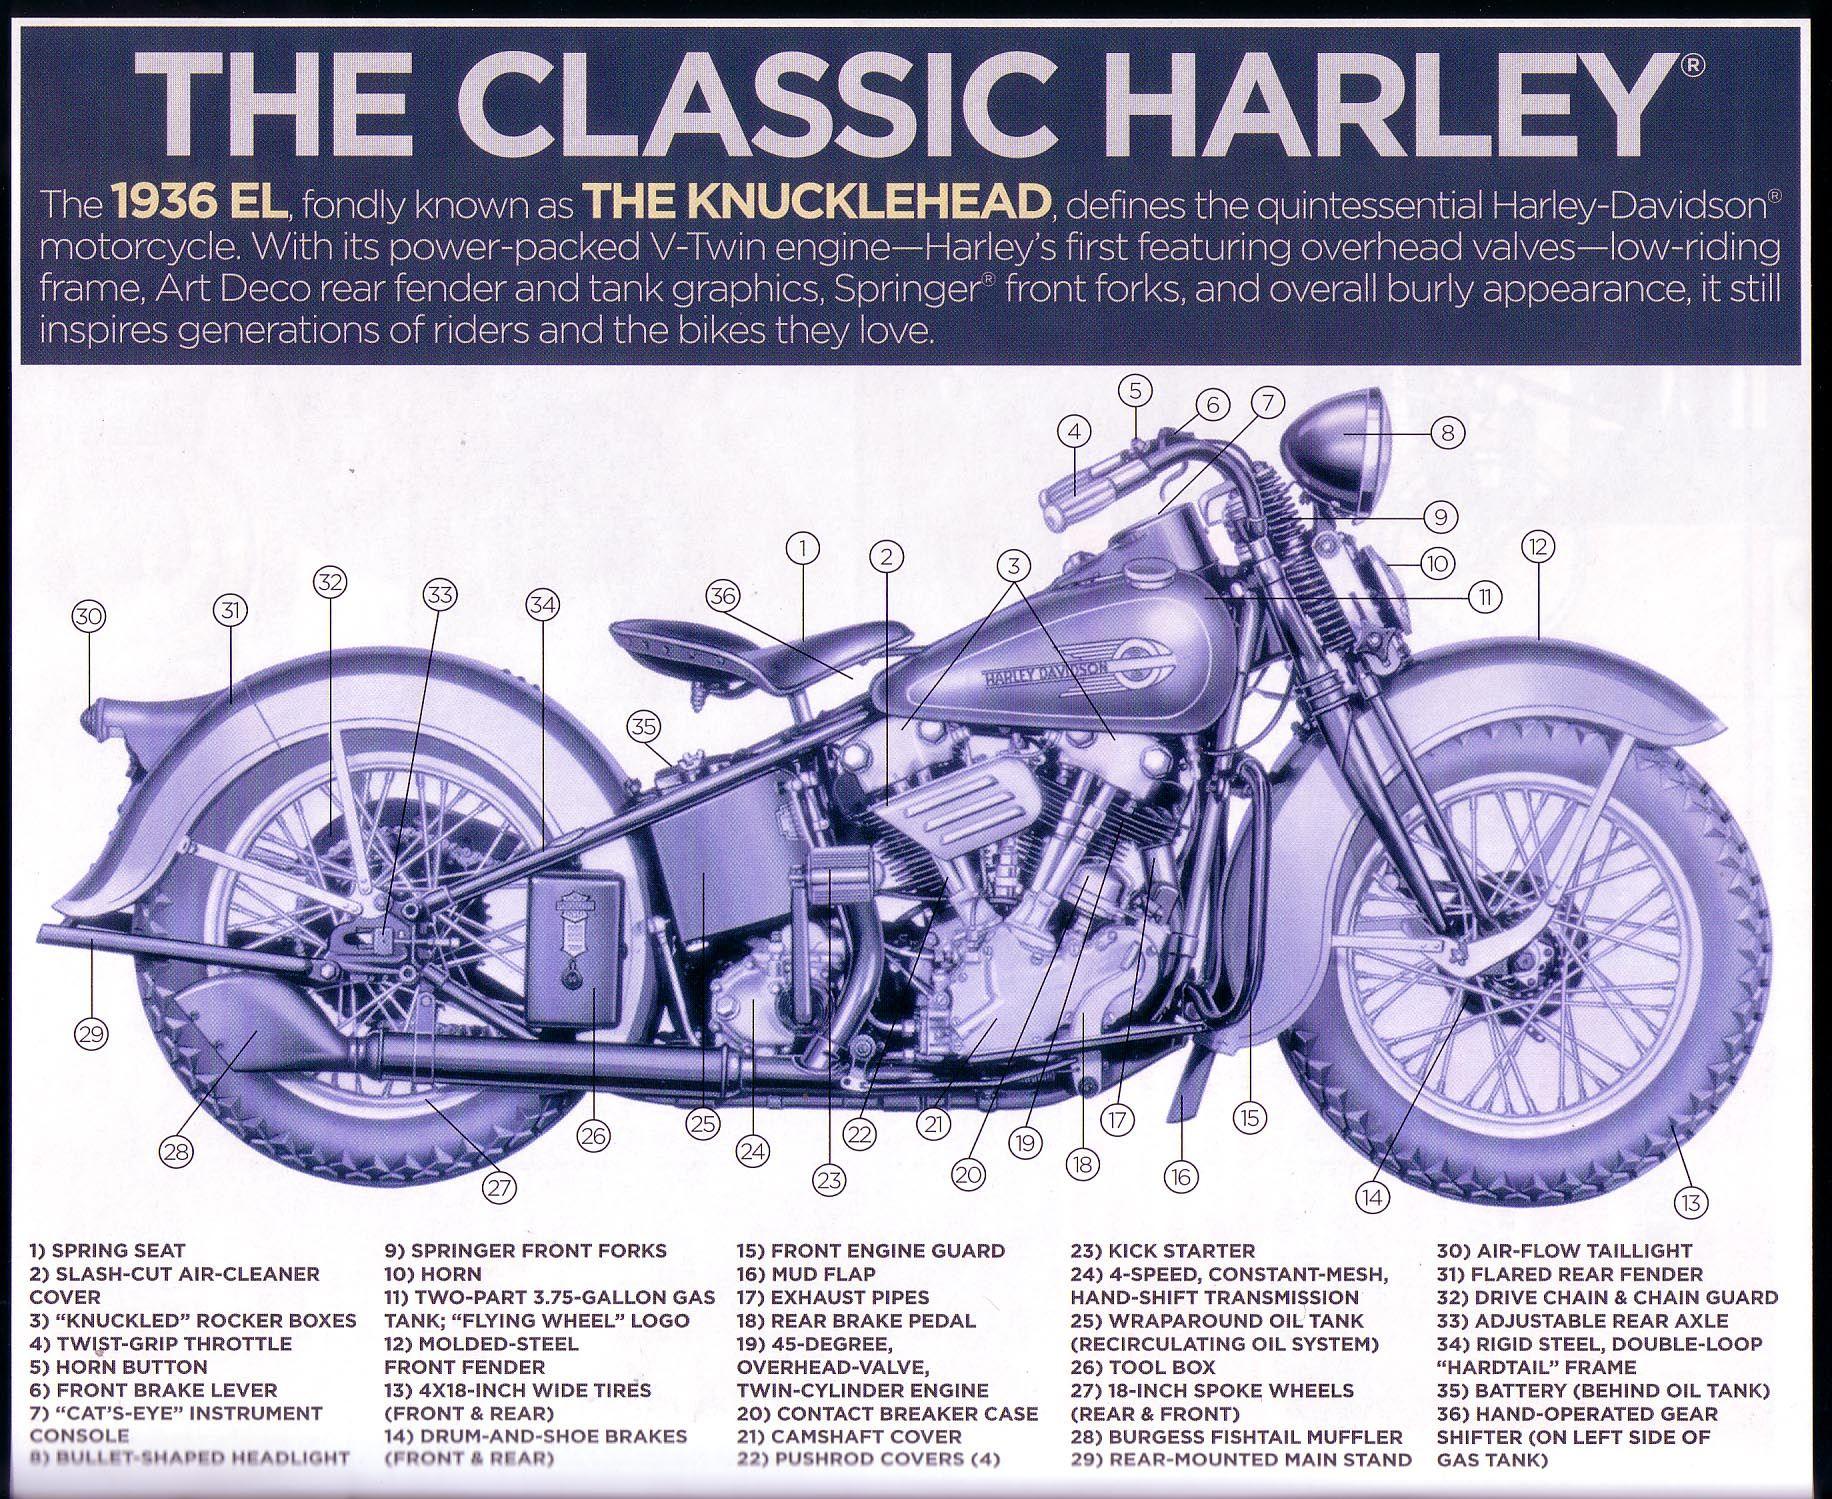 medium resolution of harley davidson motorcycle diagrams wiring diagrams harley evo parts diagram harley davidson motorcycle diagrams wiring diagram